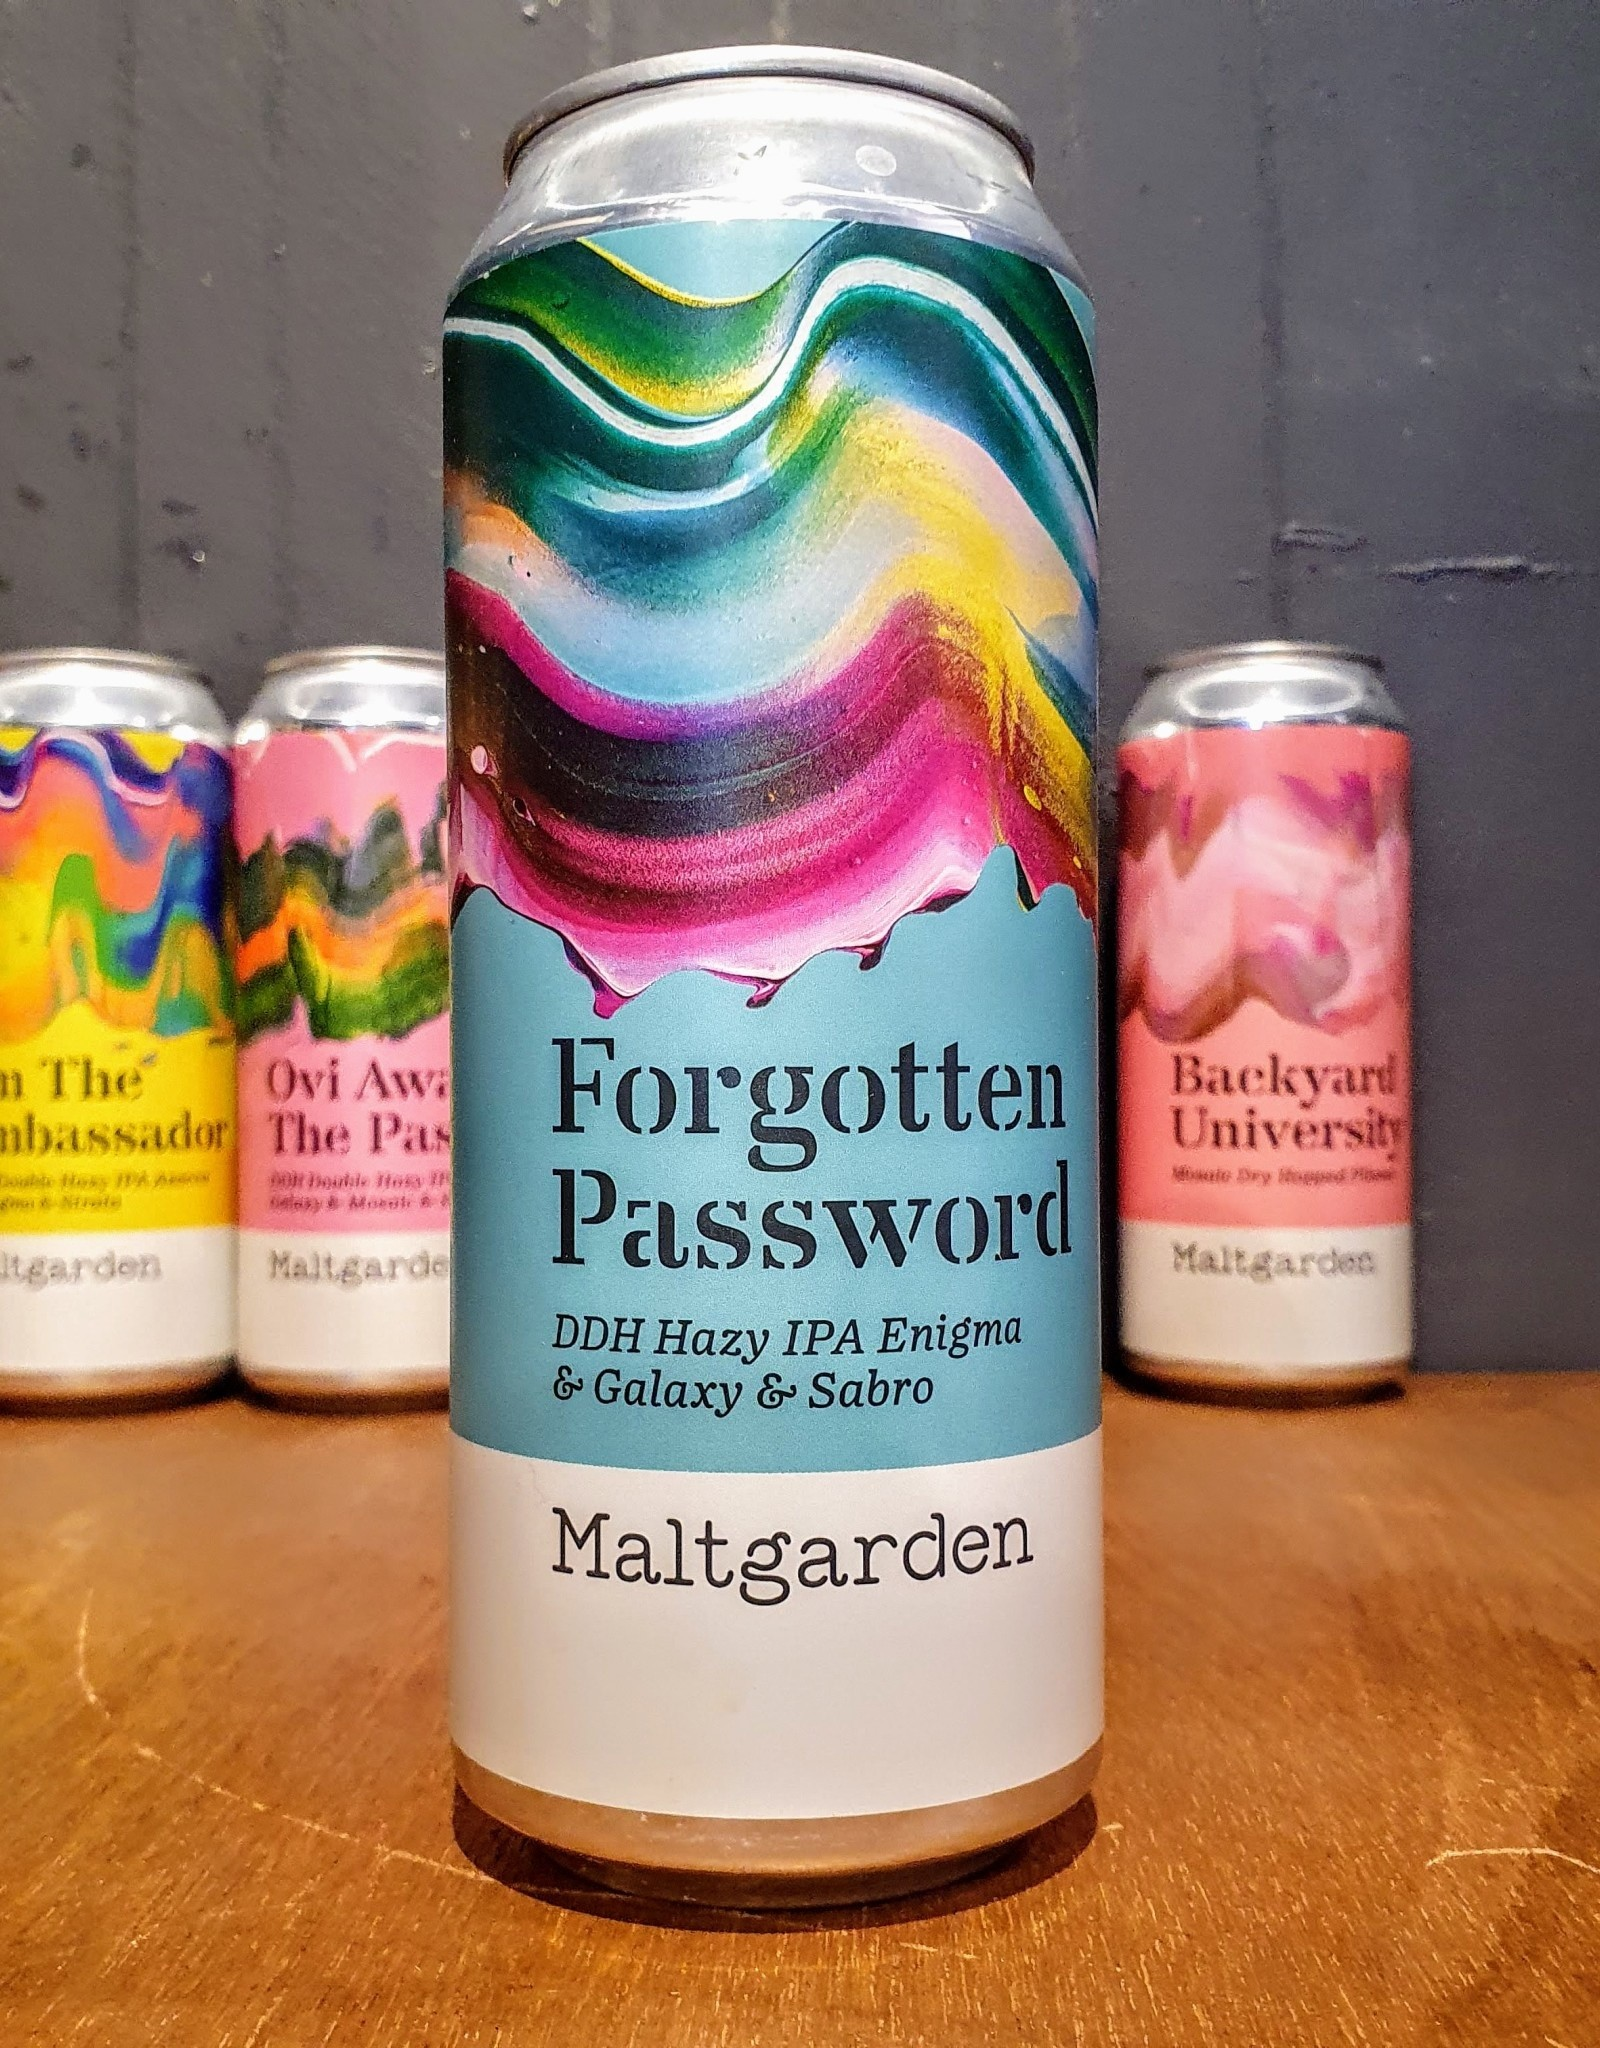 maltgarden Maltgarden: Forgotten Password